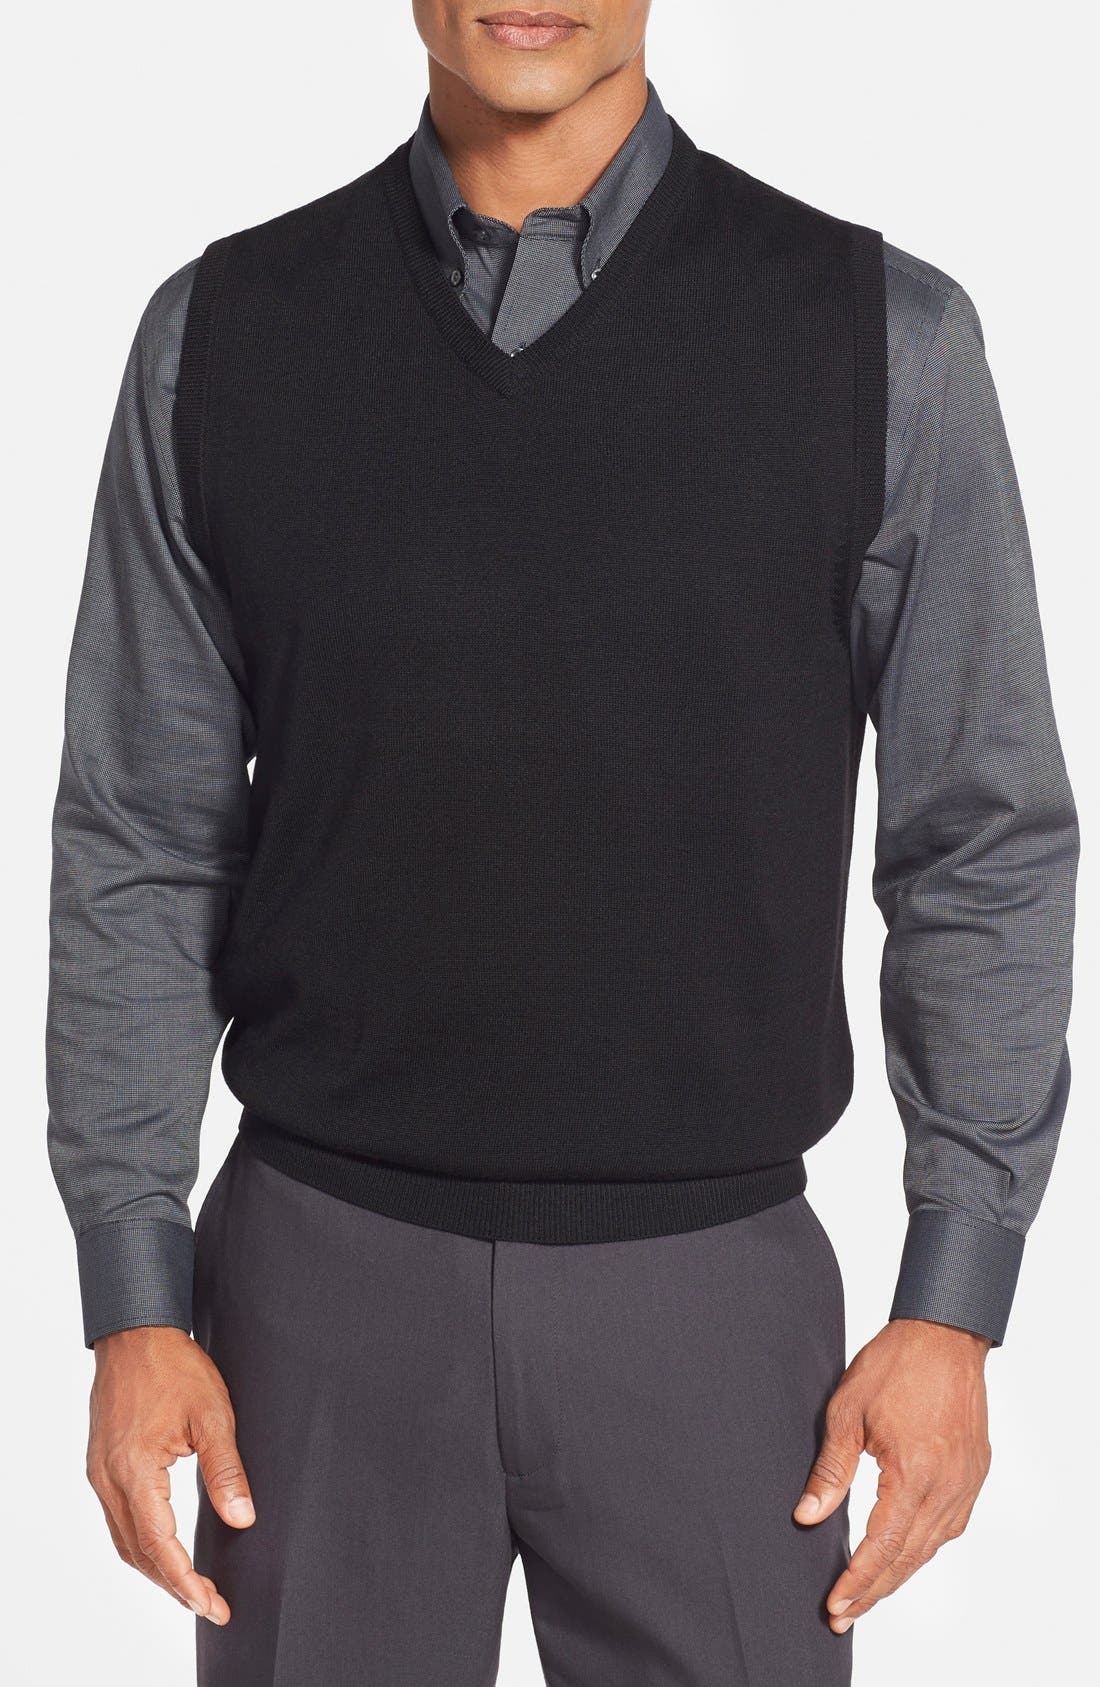 'Douglas' Merino Wool Blend V-Neck Sweater Vest,                             Main thumbnail 1, color,                             Black